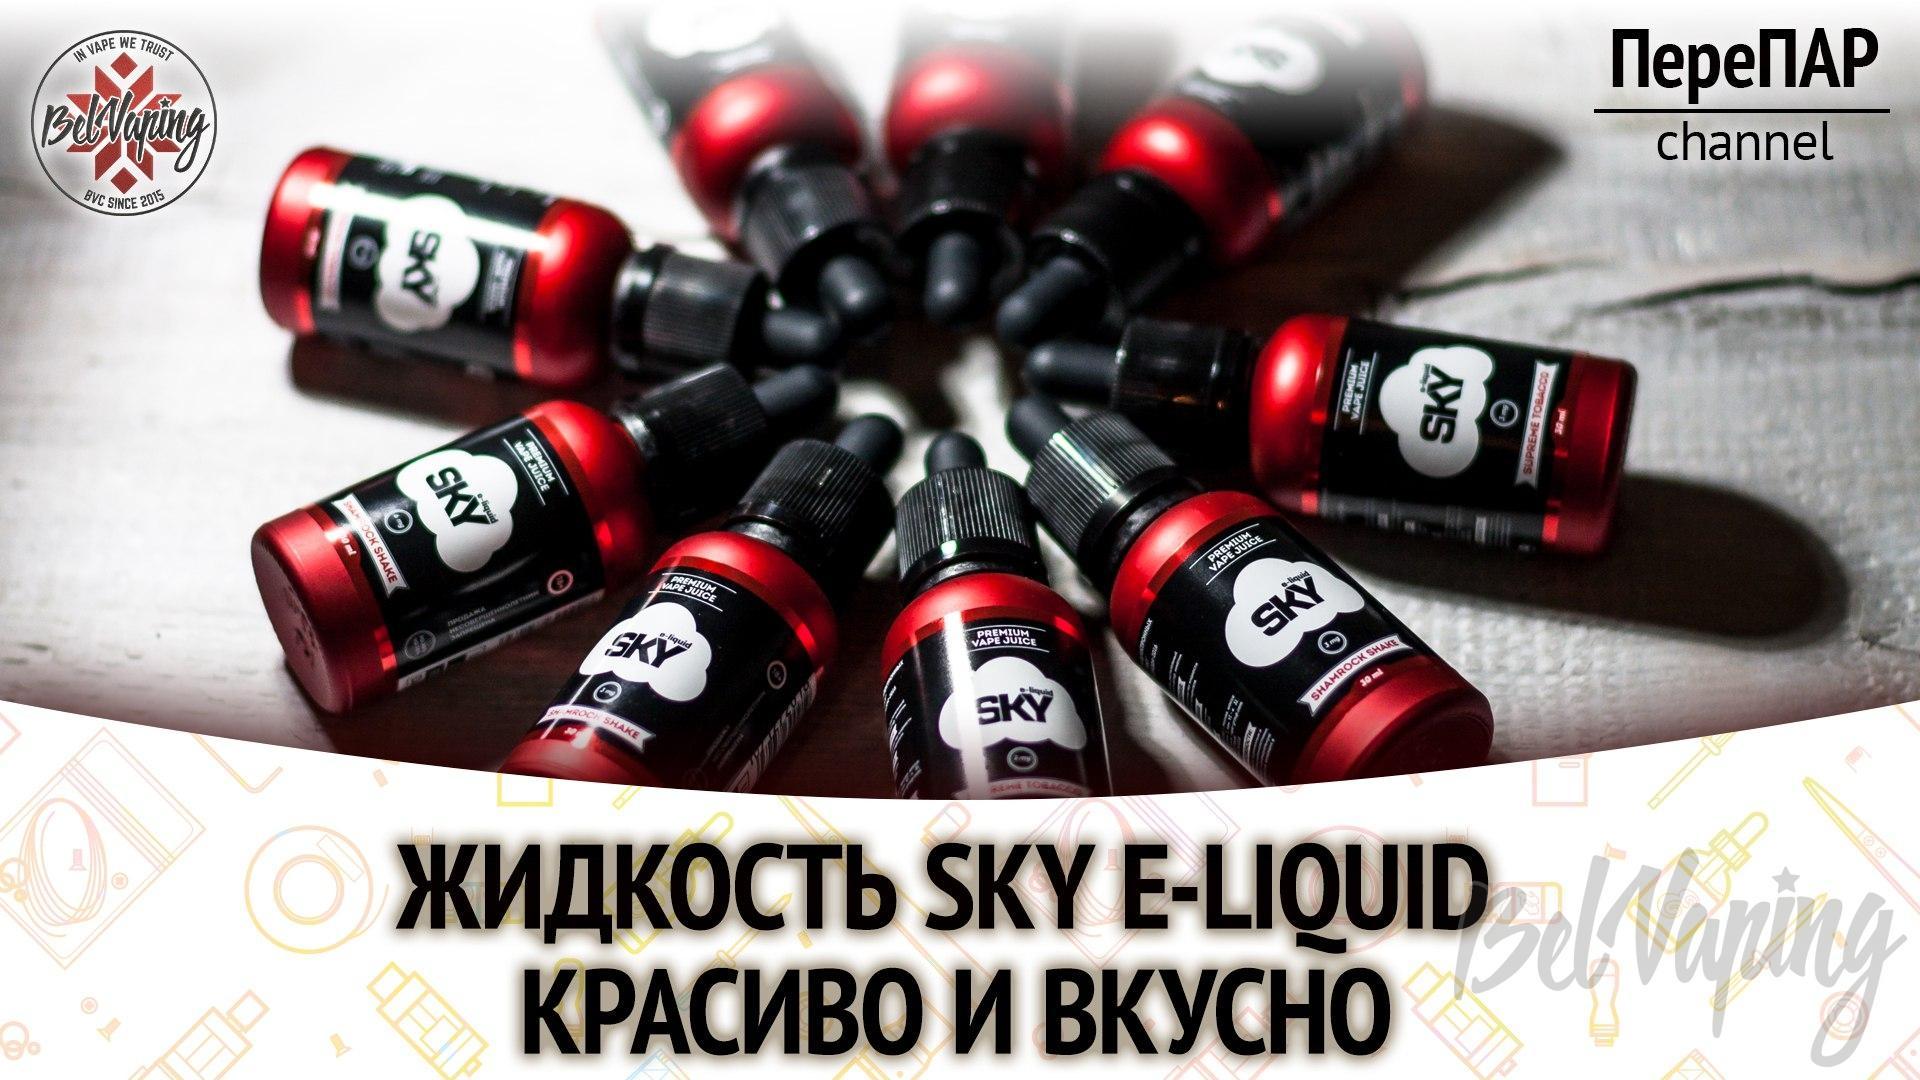 Обзор жидкости Sky e-liquid